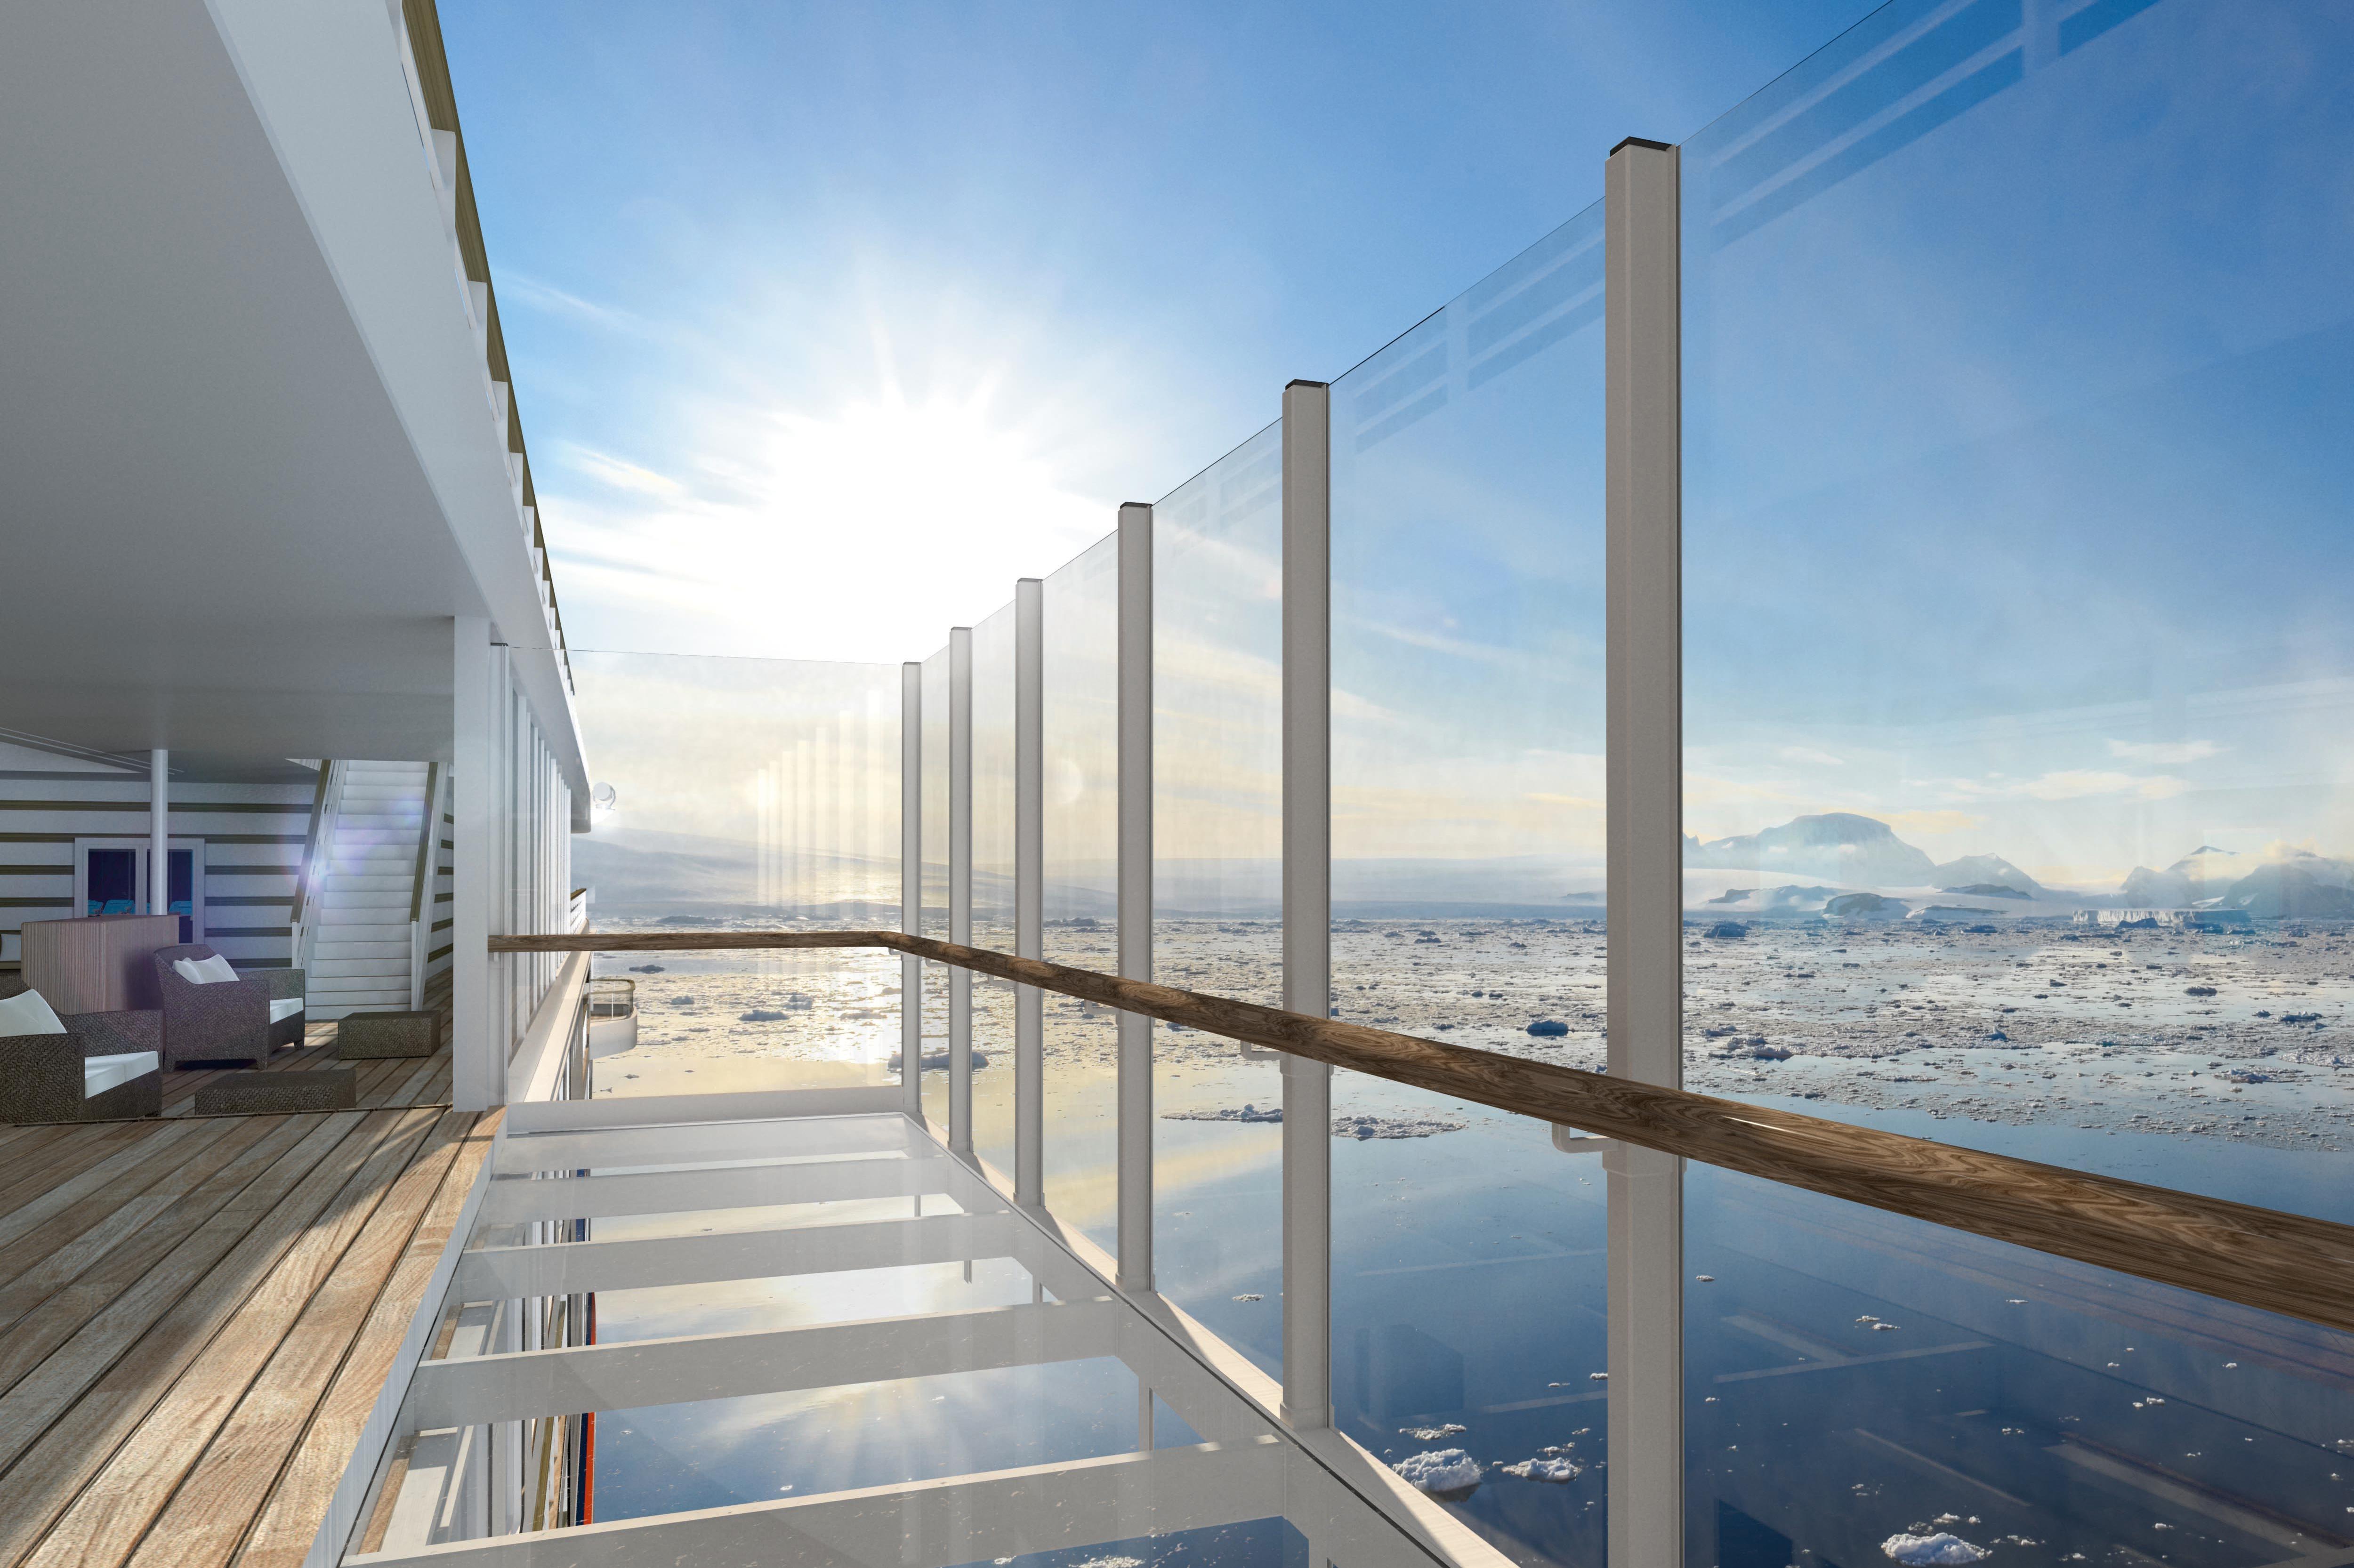 Hapag-Lloyd Cruises - Hanseatic Nature & Hanseatic Inspiration glass balcony